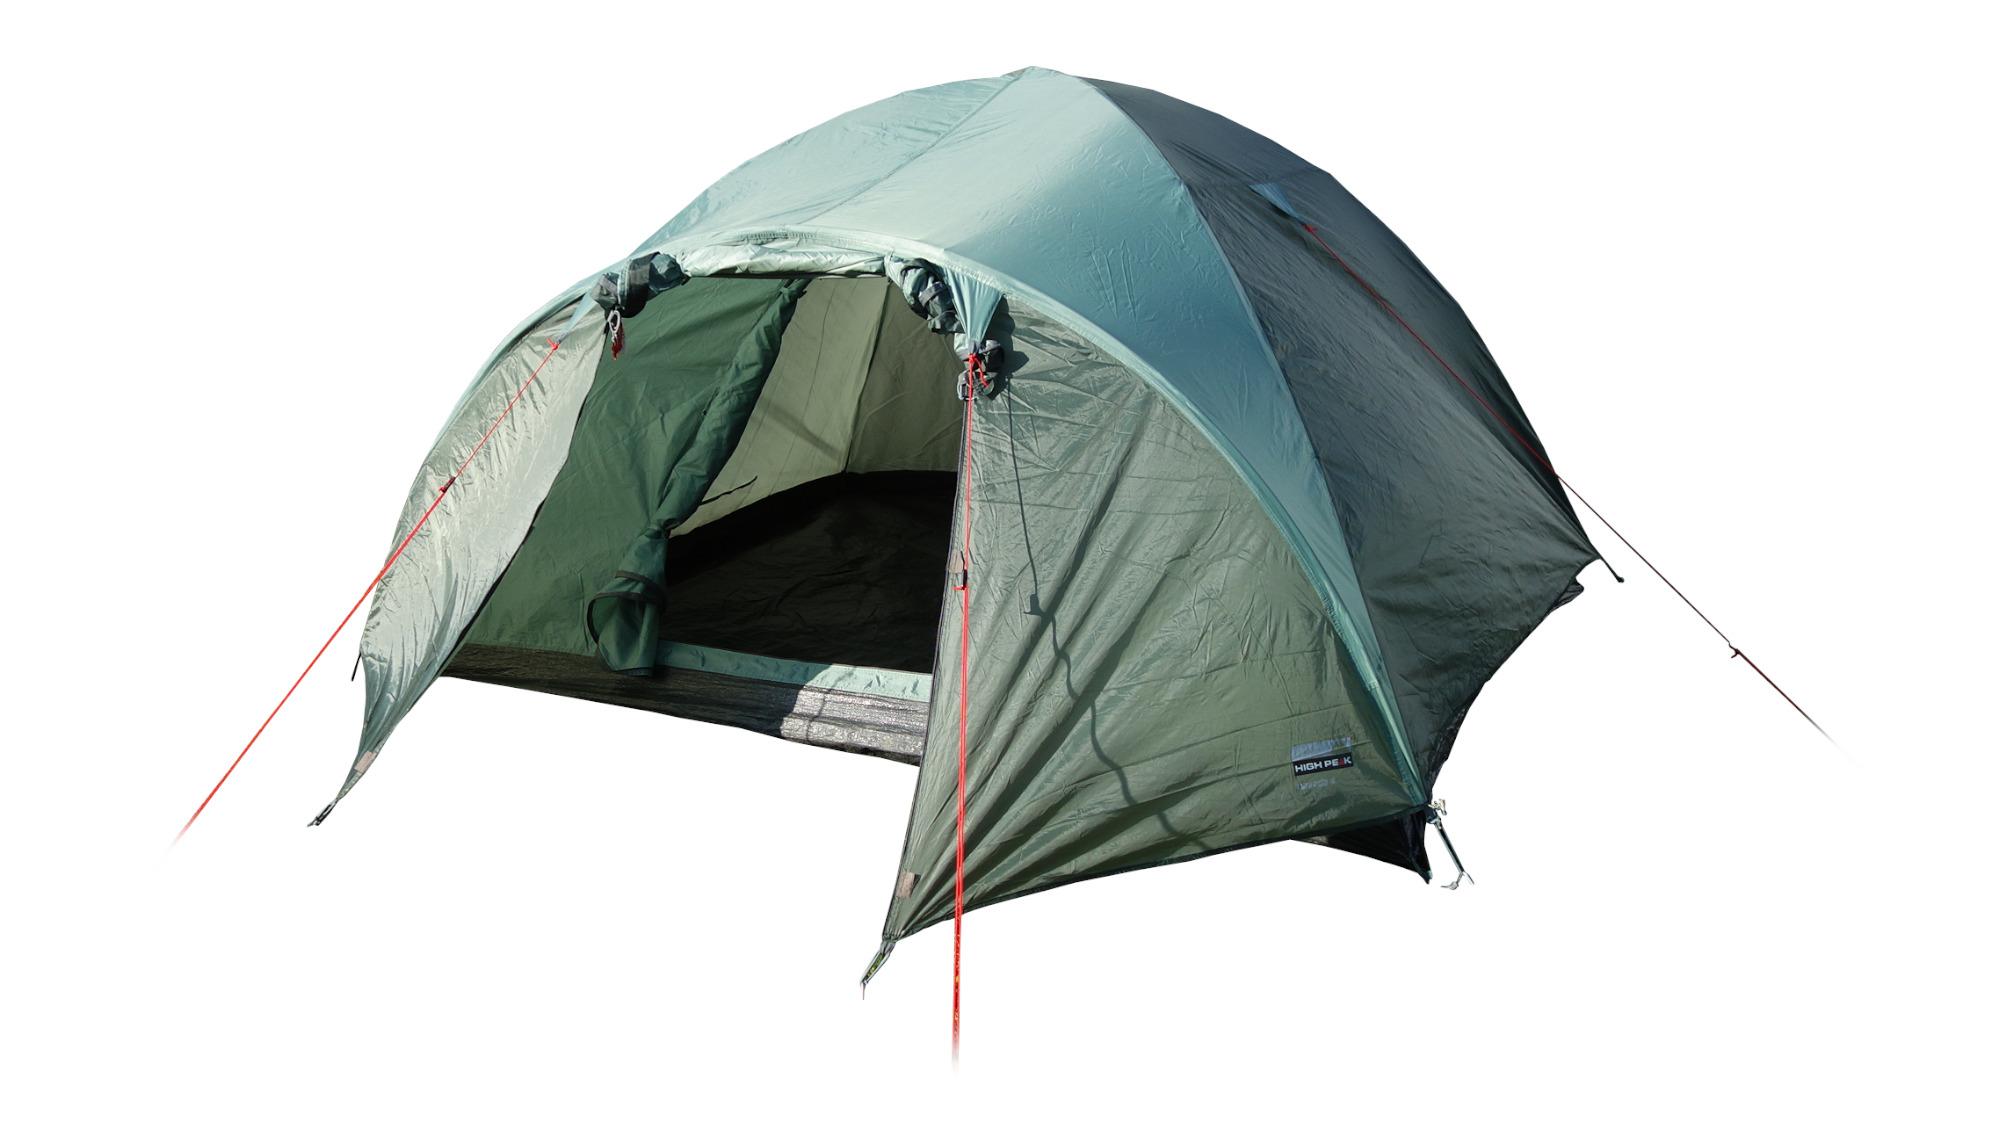 4 Personen Zelt leihen